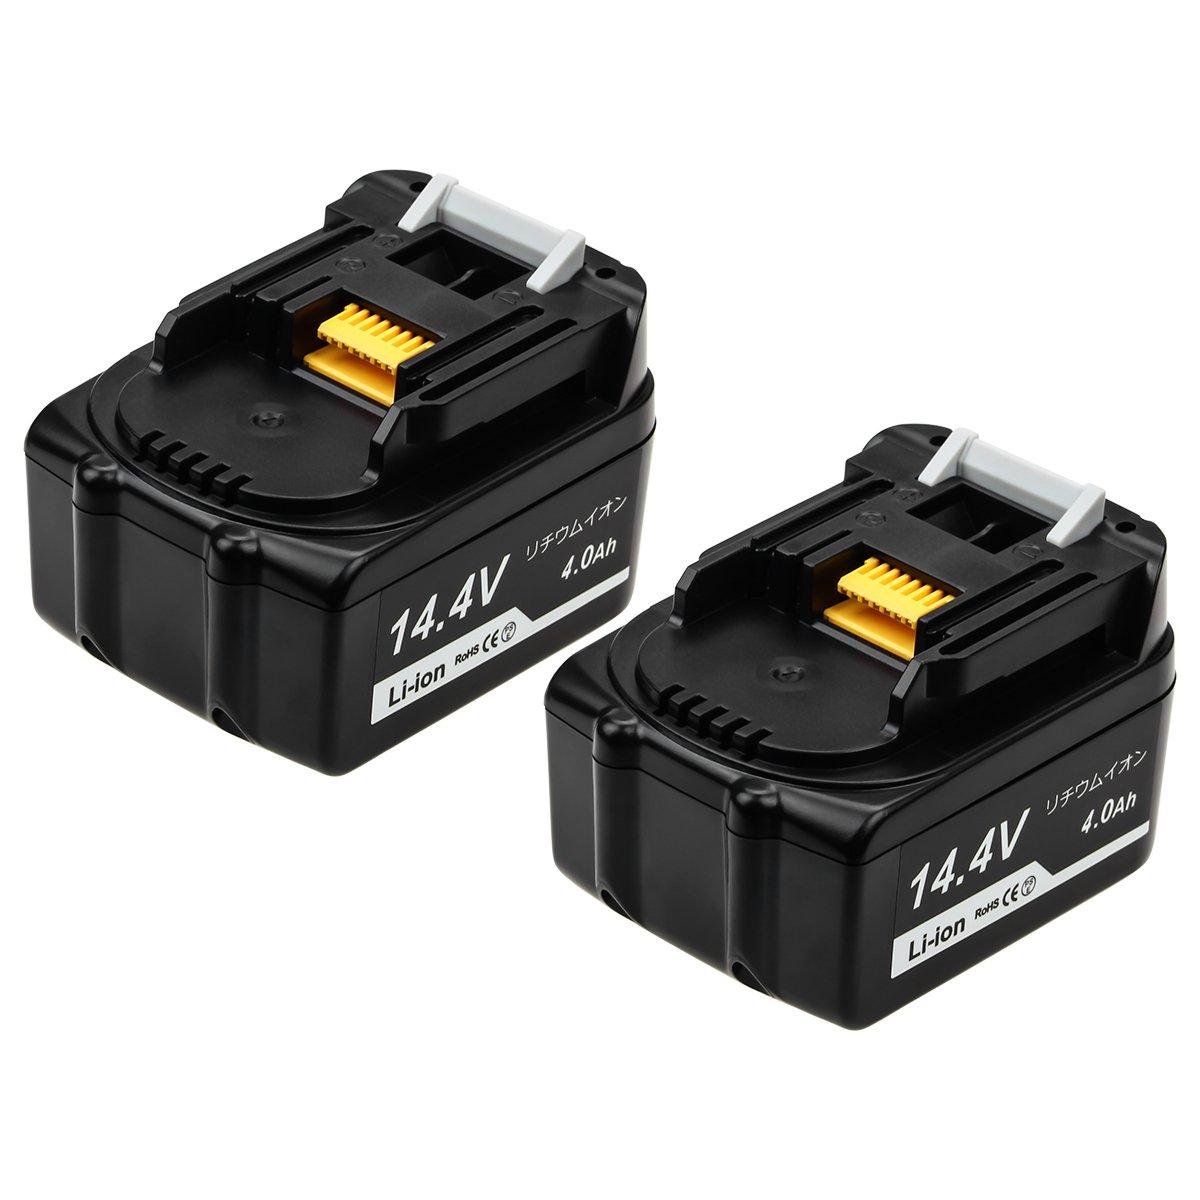 Hitachi 日立 14.4v バッテリー BSL1460B 互換 バッテリー 2個セット 14.4V 4.0Ah BSL1430 BSL1440 BSL1450対応 リチウムイオン電池 電動工具用 4000mAh 充電池 Li-ion 保護回路内蔵 一年長期保証付き「Bluway」 (2) B078GR179G BSL1460B-2 BSL1460B-2